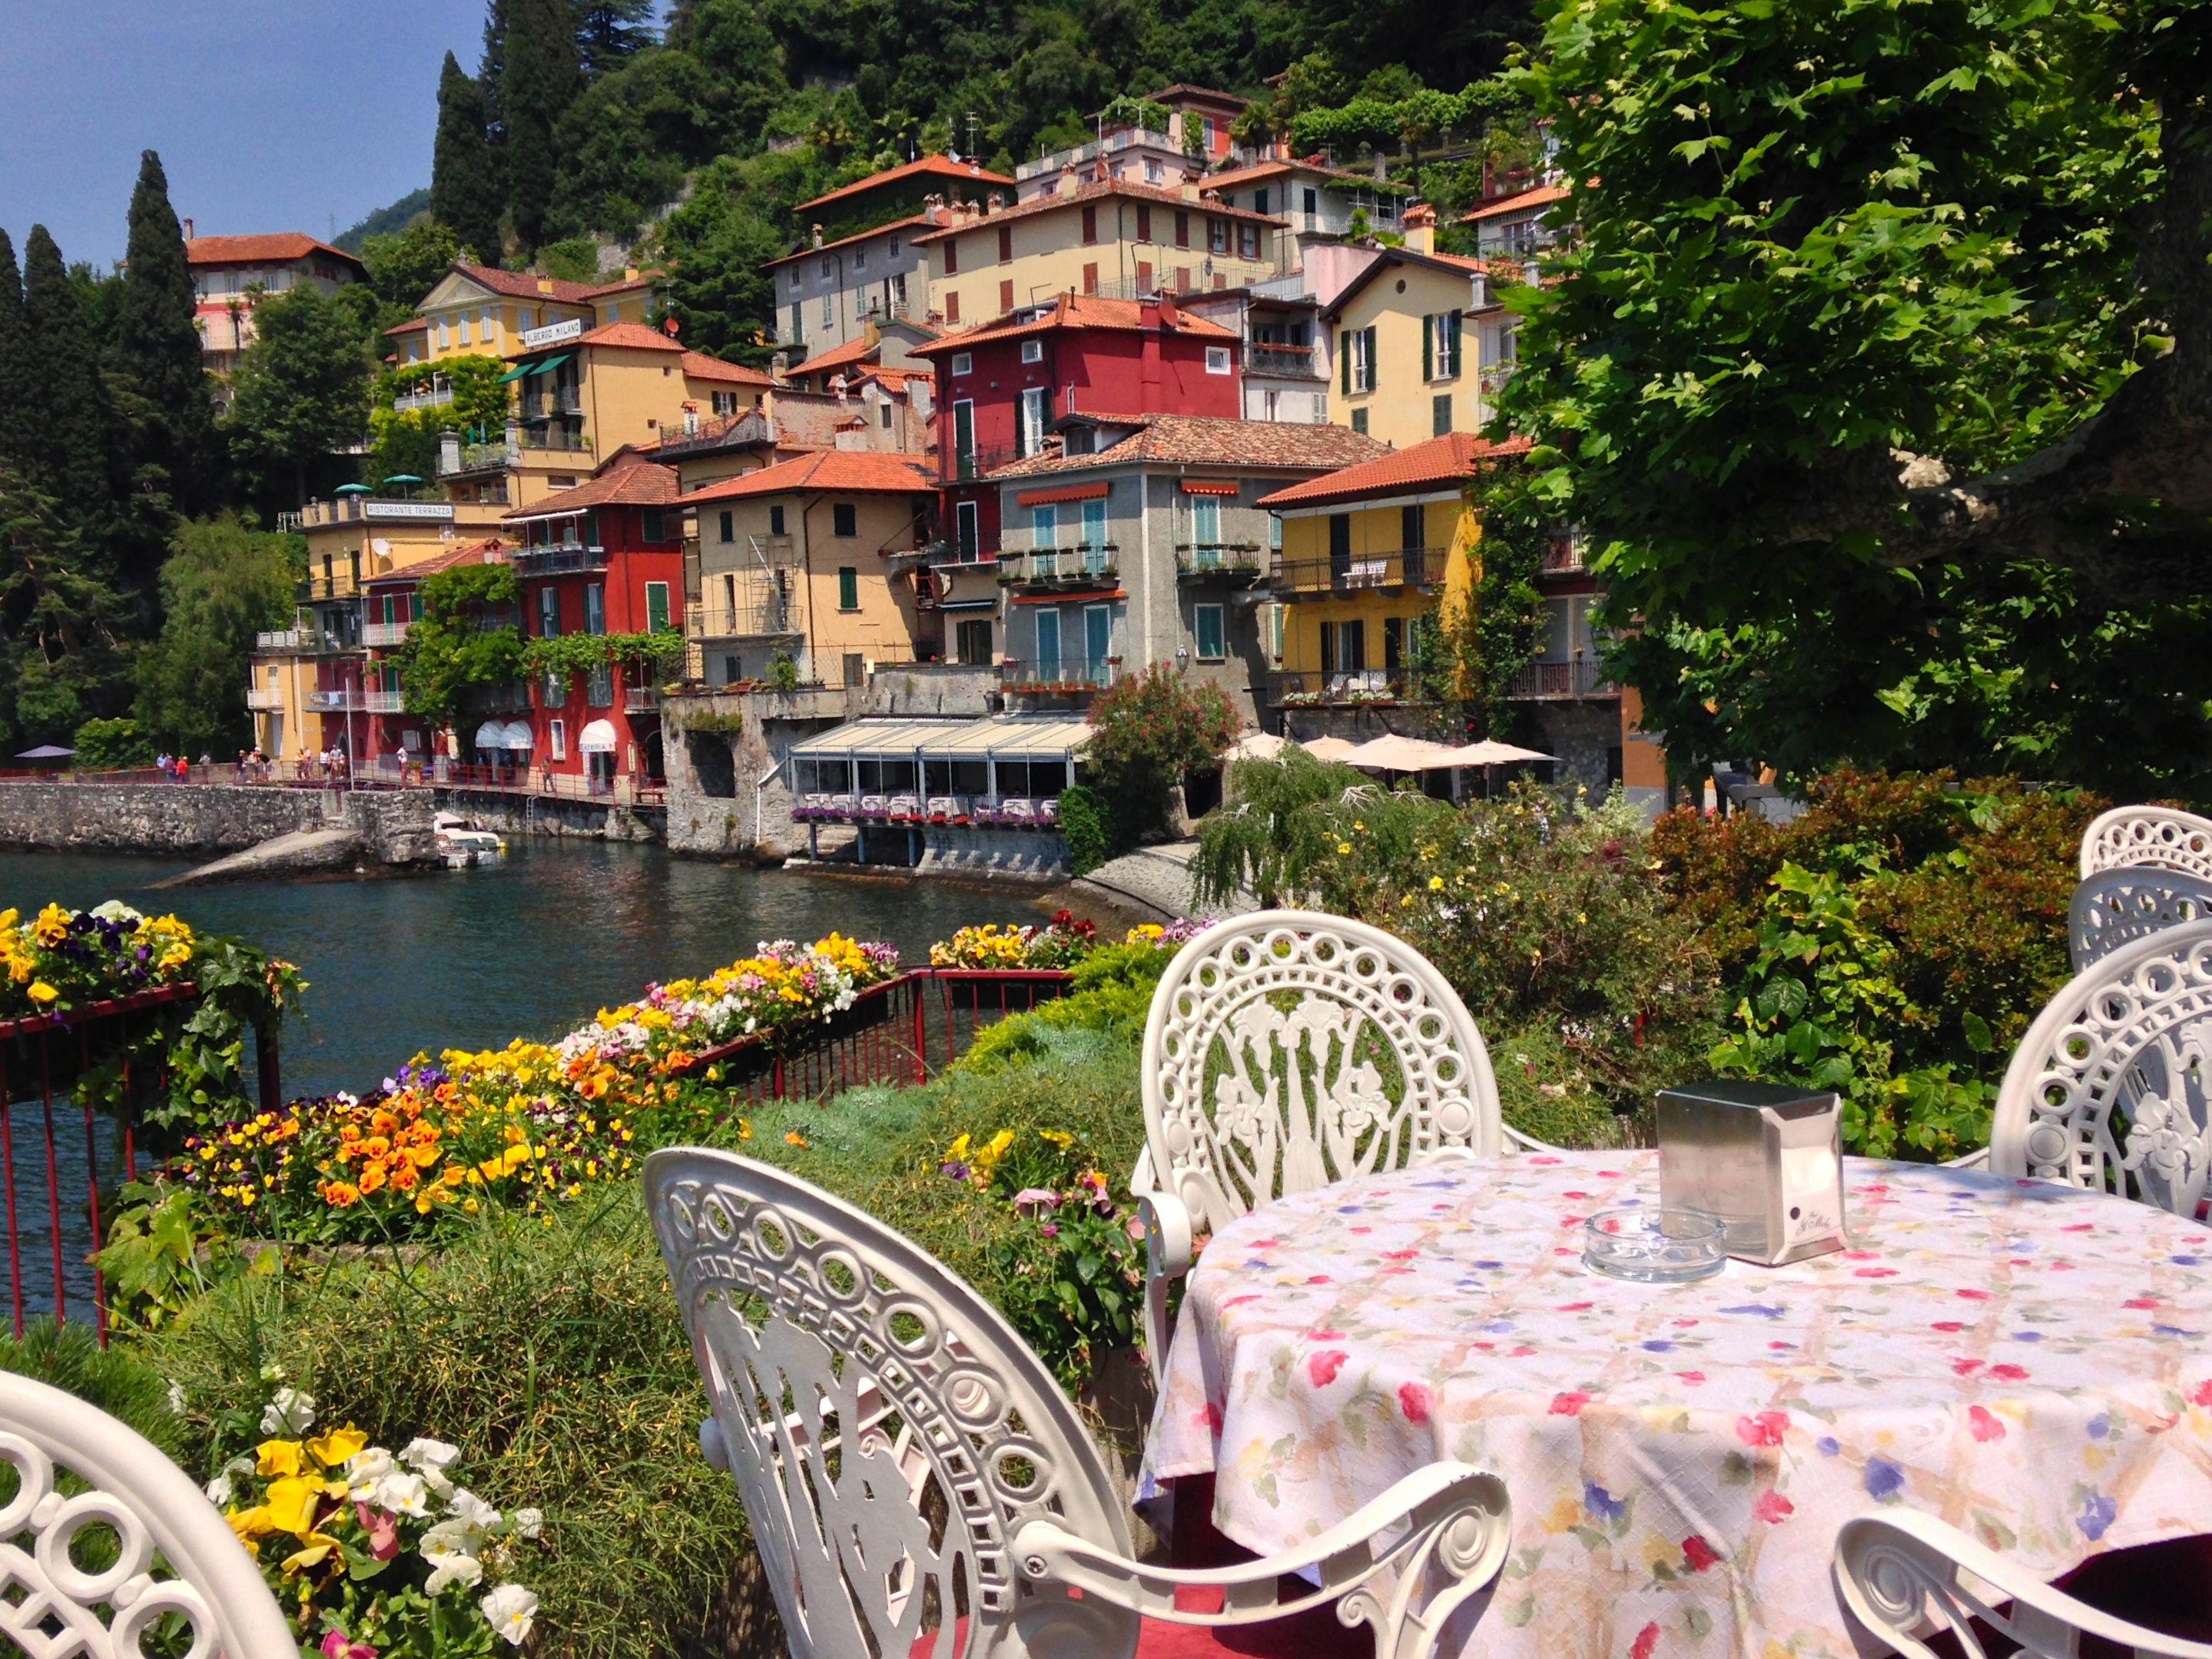 Bar Il Molo Varenna By Laura Gurton Beautiful Places